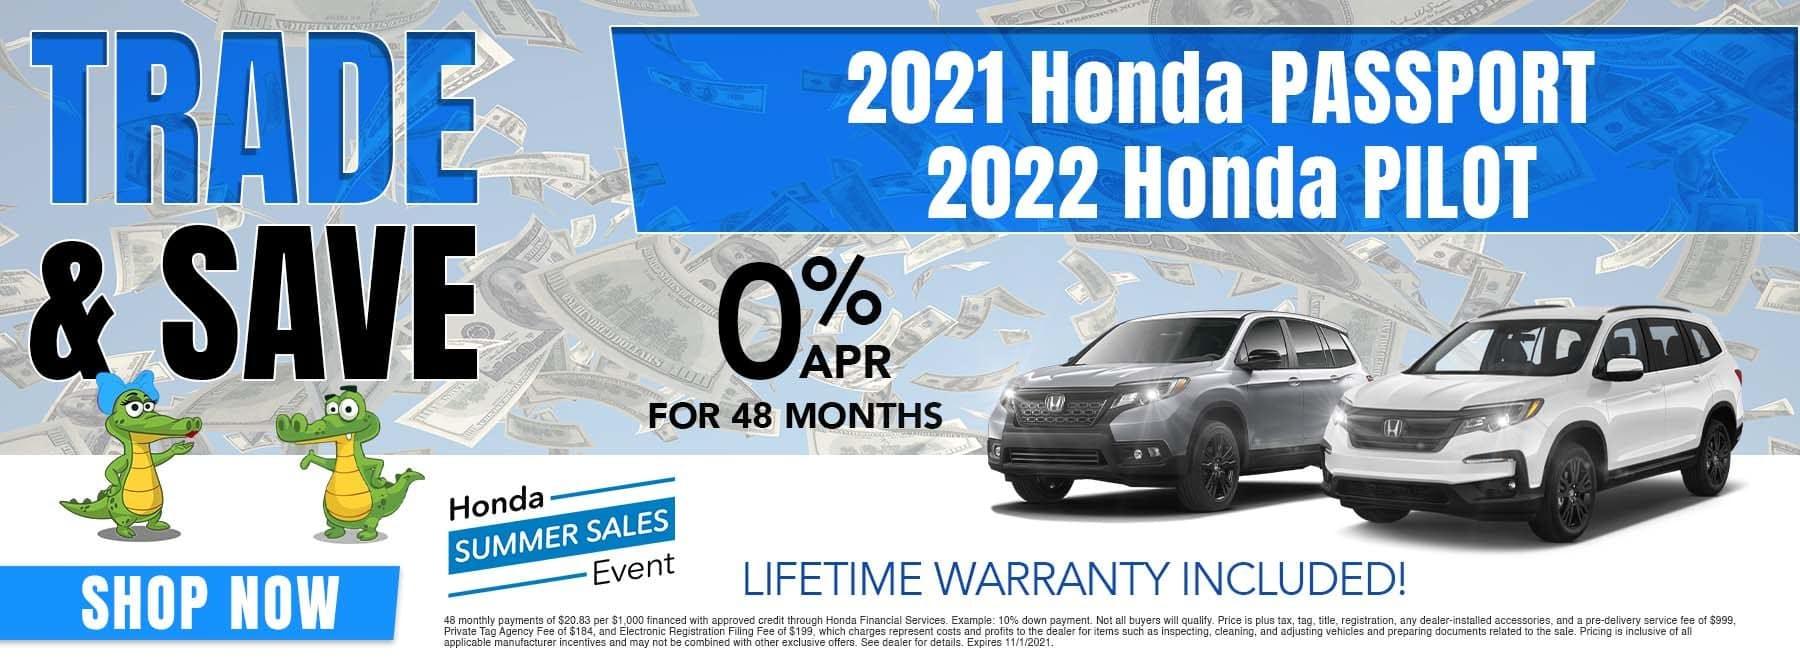 Trade & Save | 2021 Honda Passport, 2022 Honda Pilot | 0% APR For 48 Months | Lifetime Warranty Included